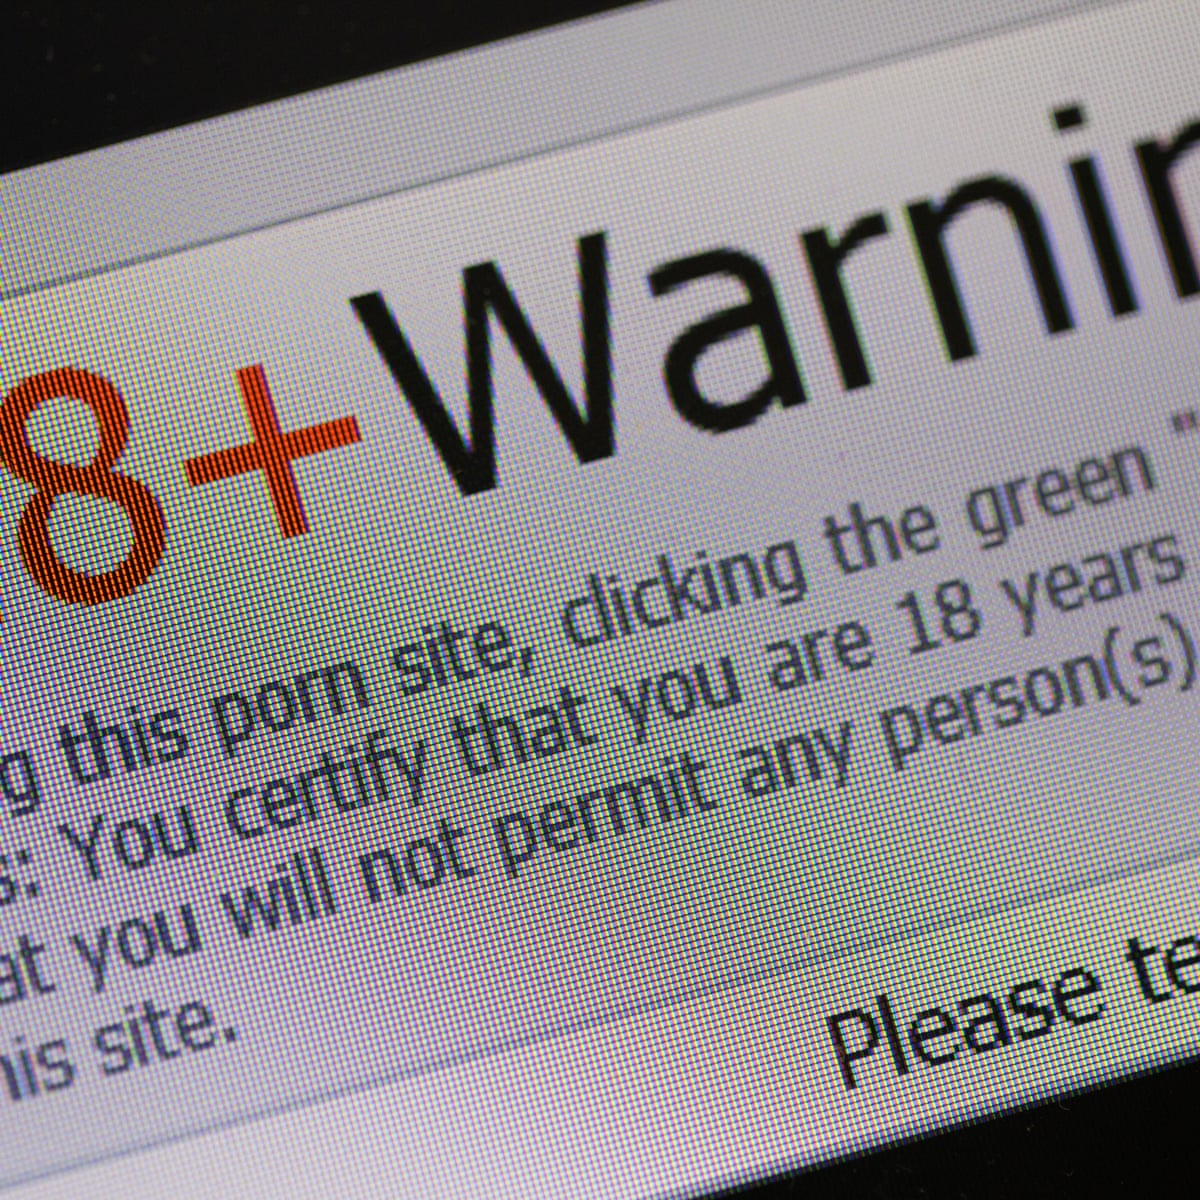 Aussie Browser Porn australia could implement mandatory age verification for